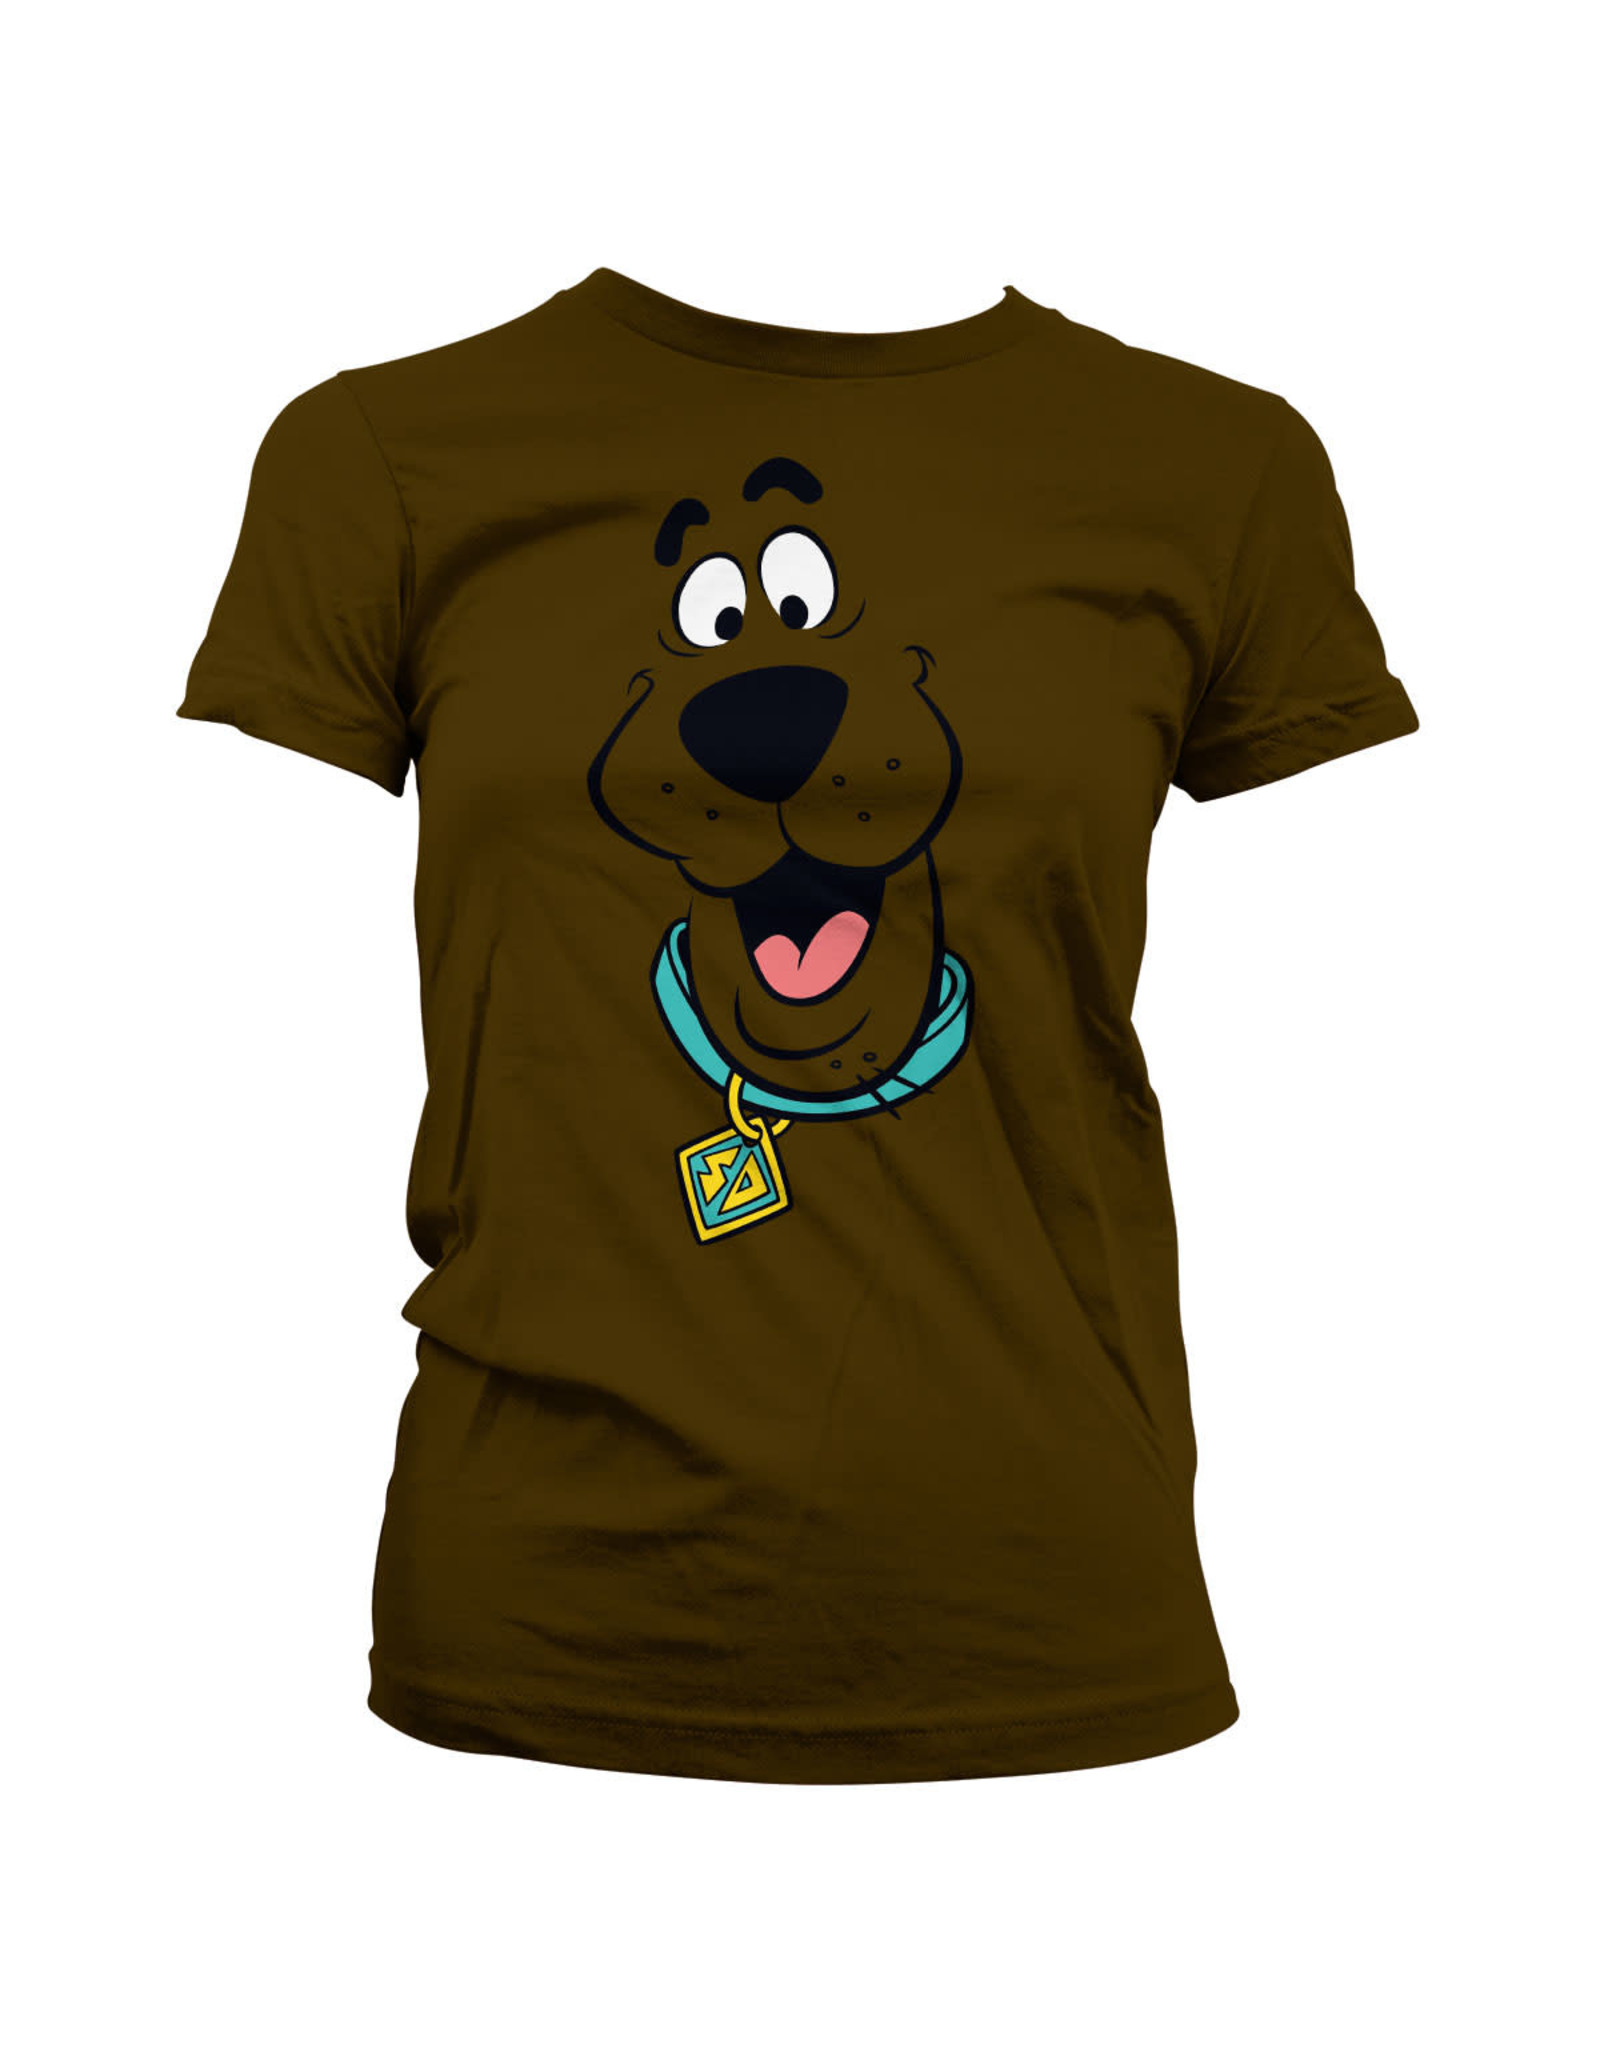 SCOOBY-DOO - T-Shirt Scooby Doo Face - GIRL (S)